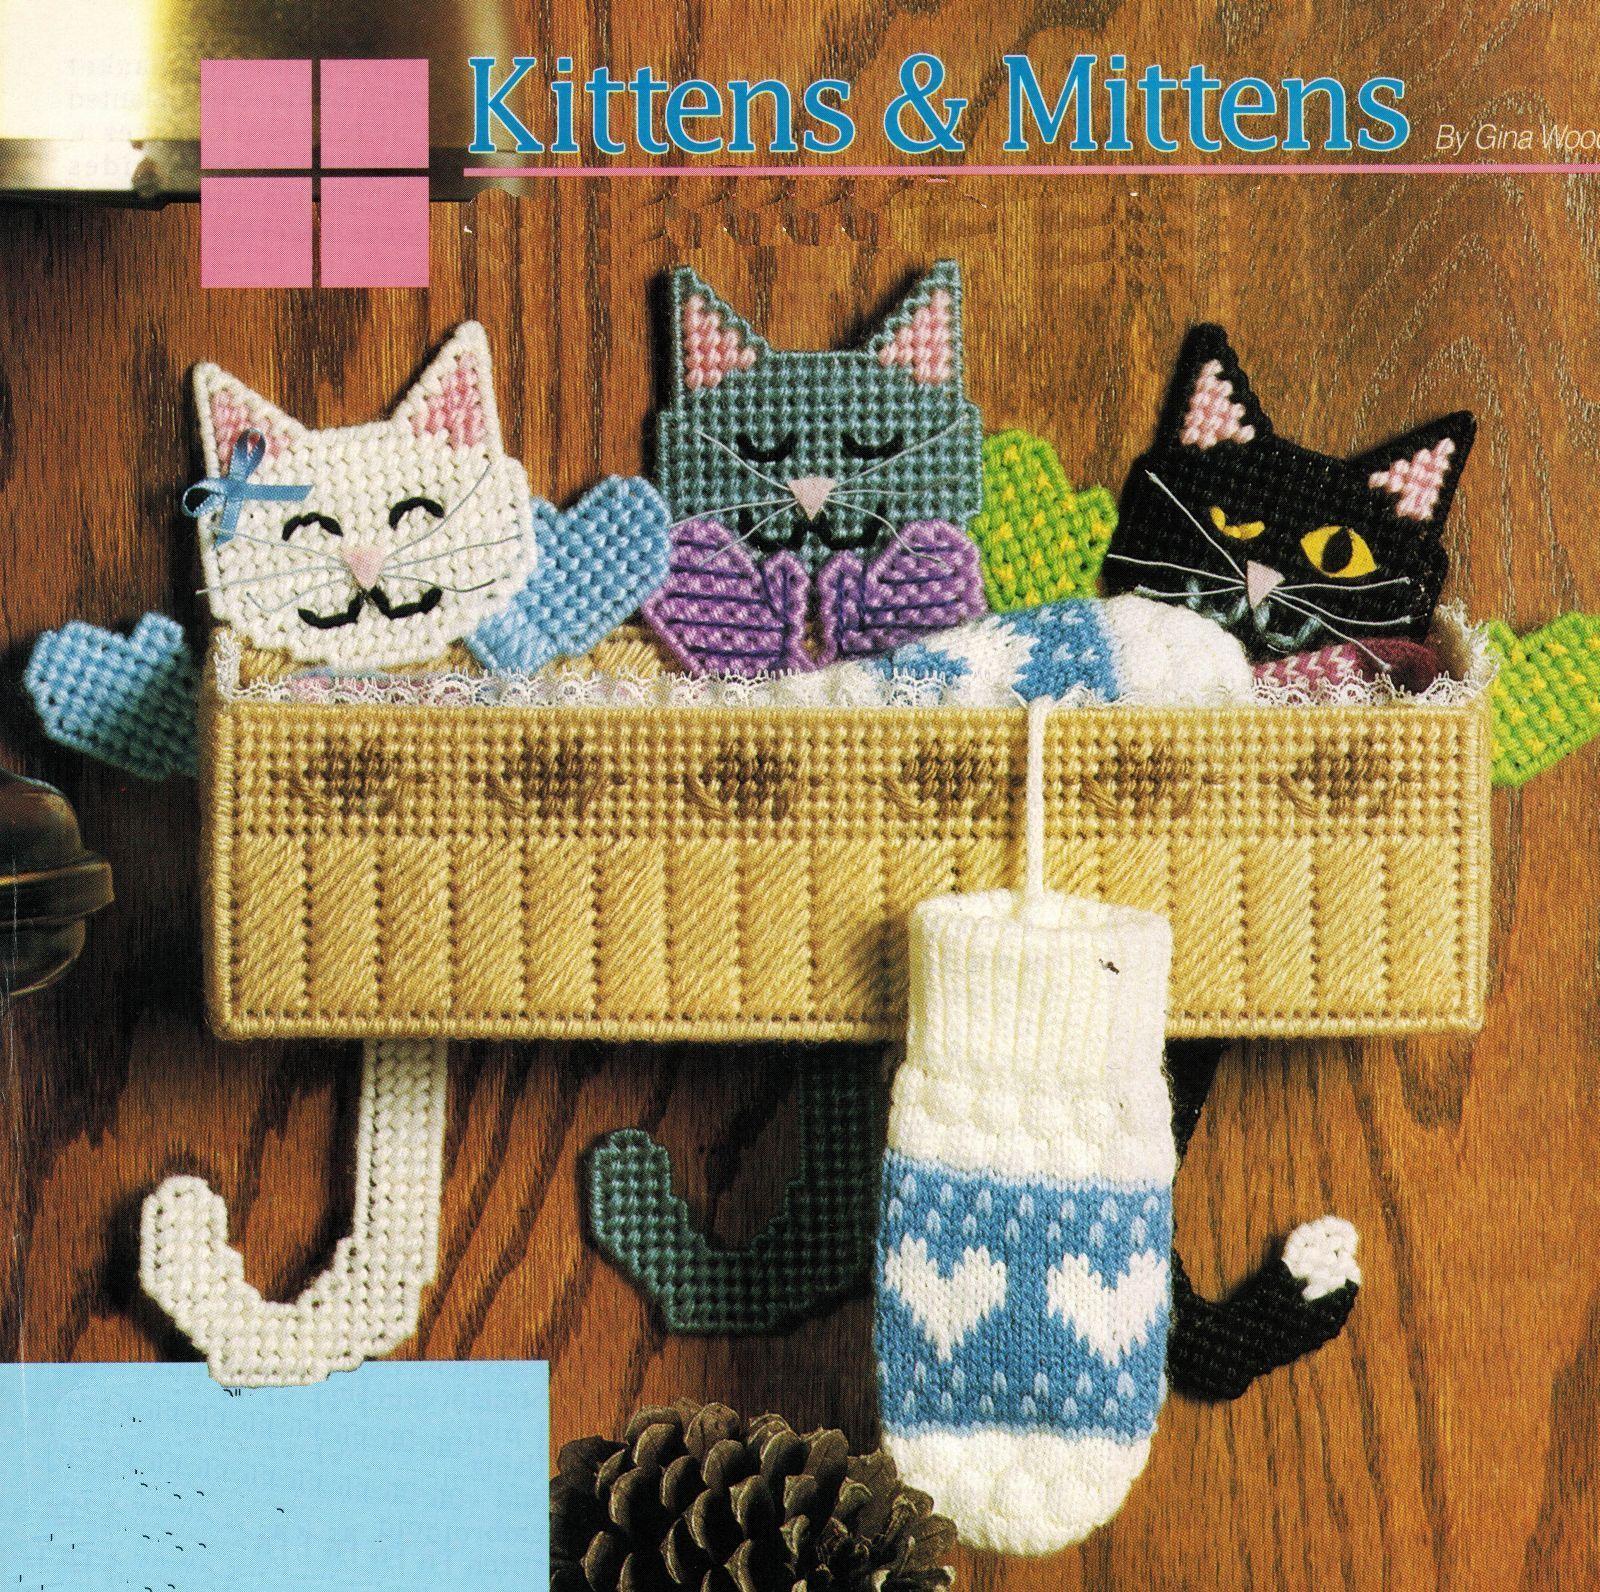 Pin By Mimafield On Needlepoint In 2020 Kitten Mittens Needlepoint Patterns Cow Pattern